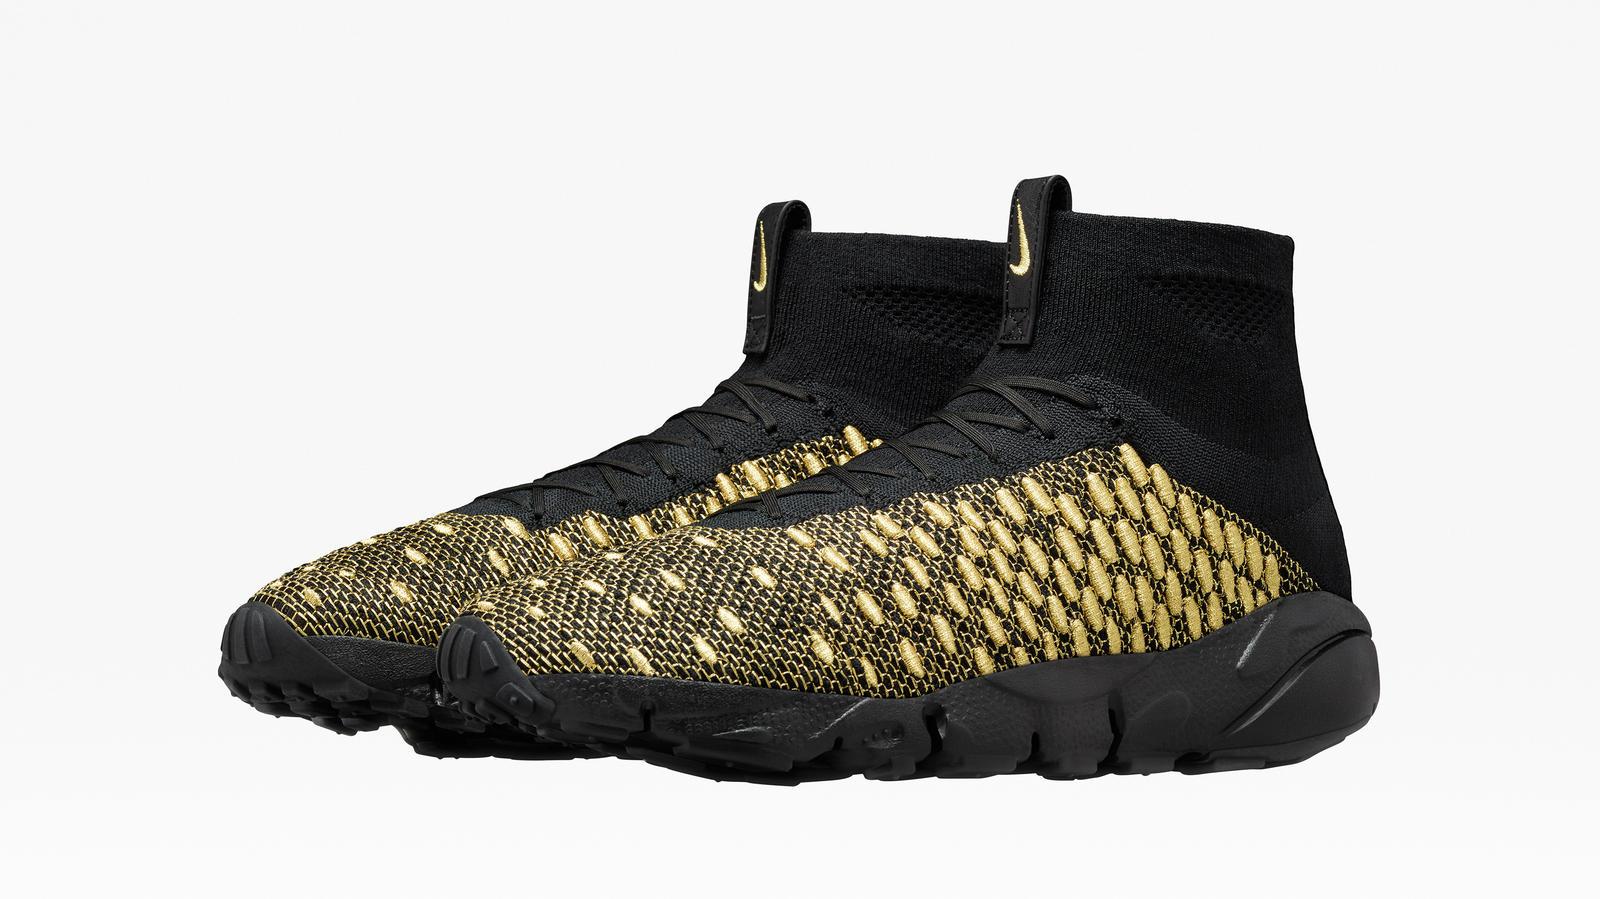 NikeLab_Footscape_Magista_x_OR_4_hd_1600.jpg